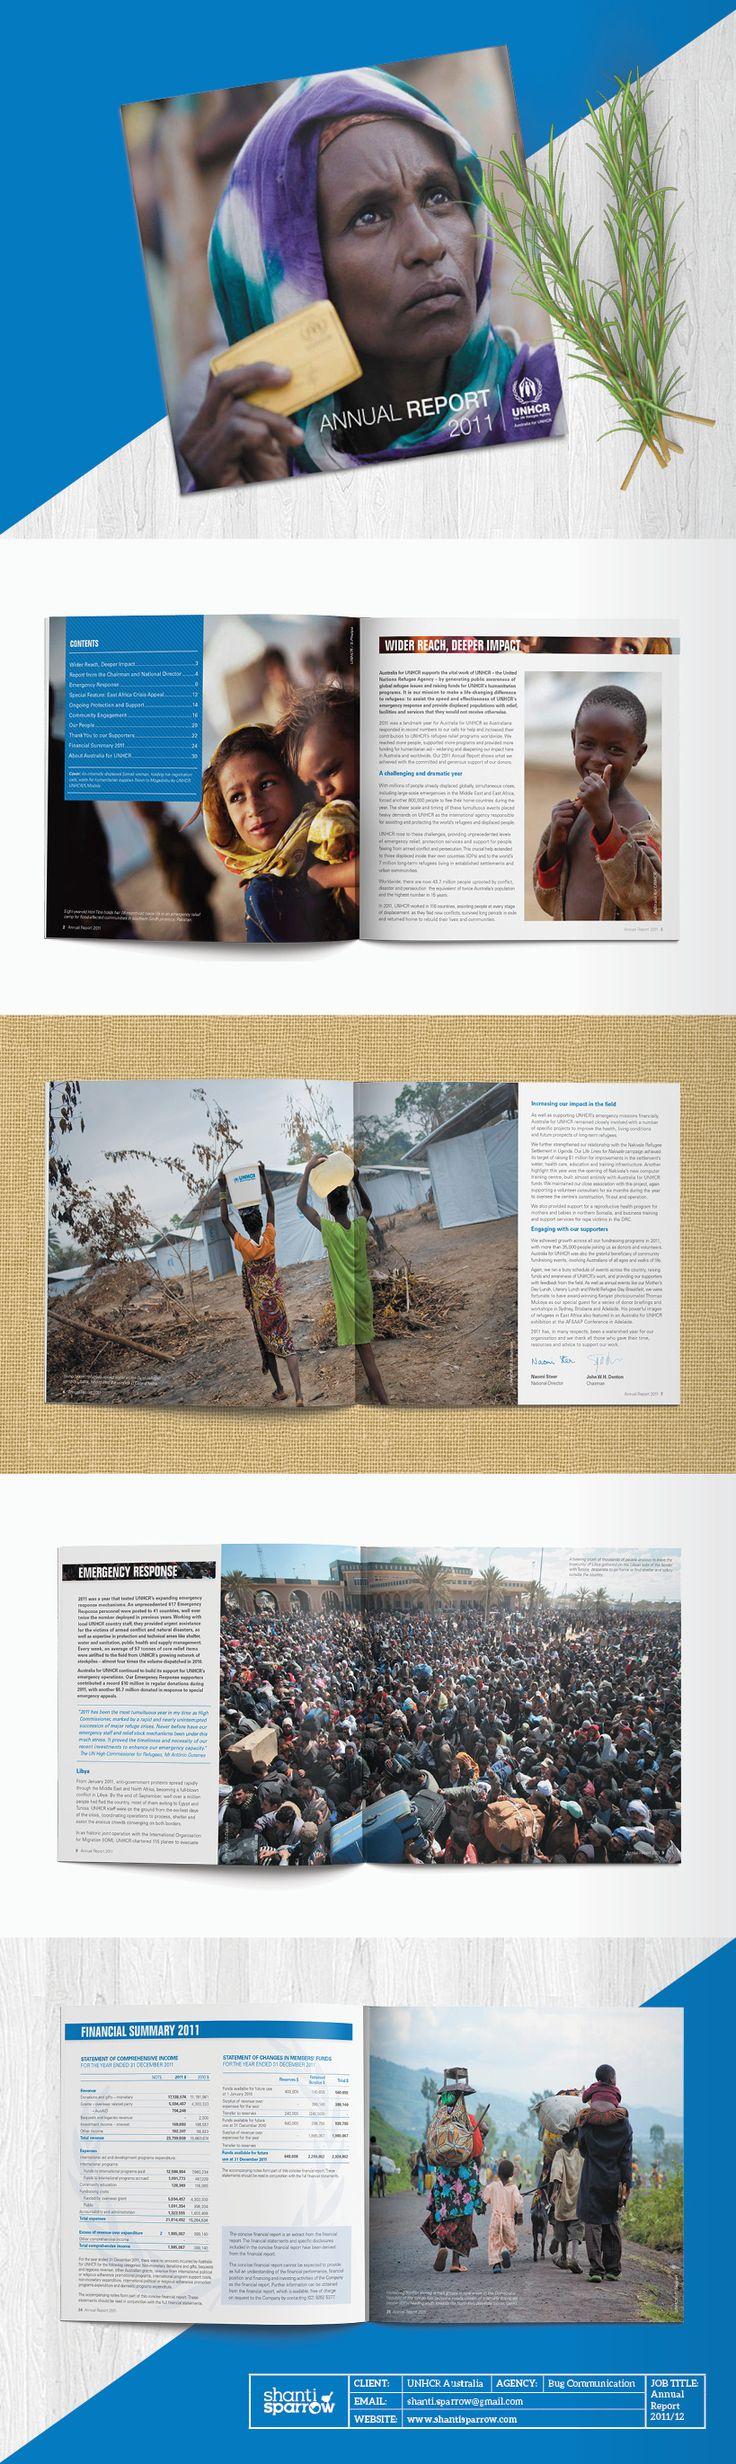 shanti_sparrow_Design_25_UNHCR_Annual_Report_Layout_Brochure